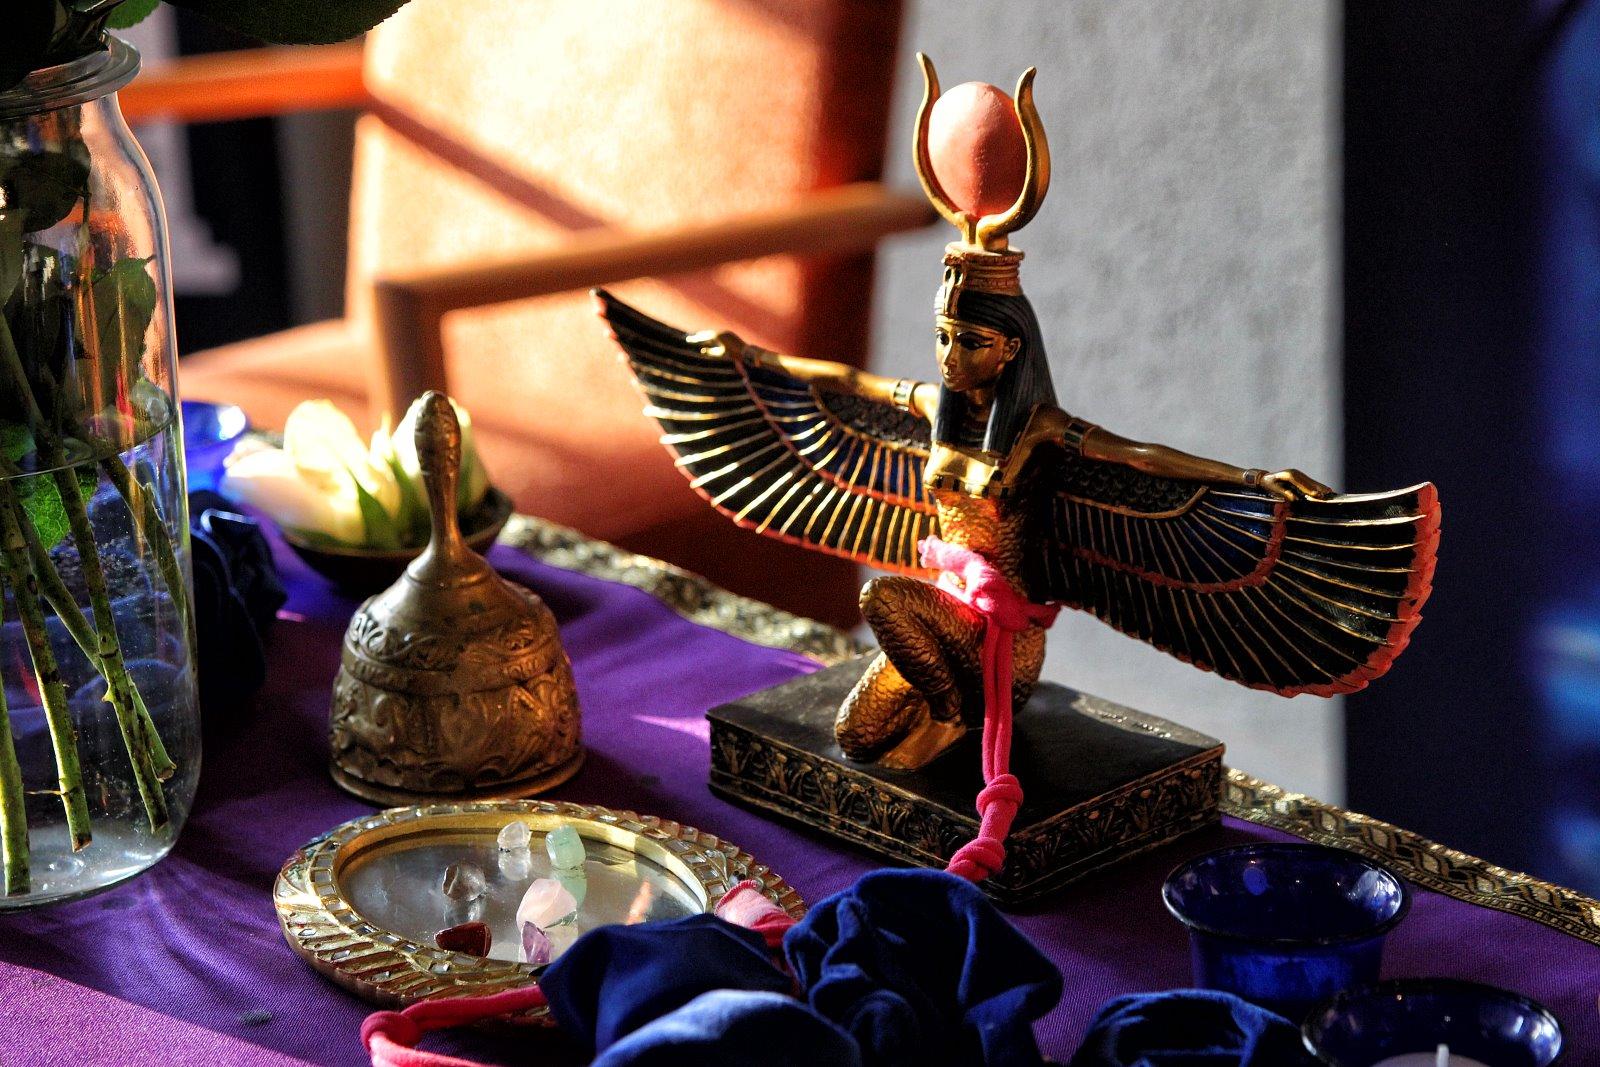 The Magical Mirror of Hathor